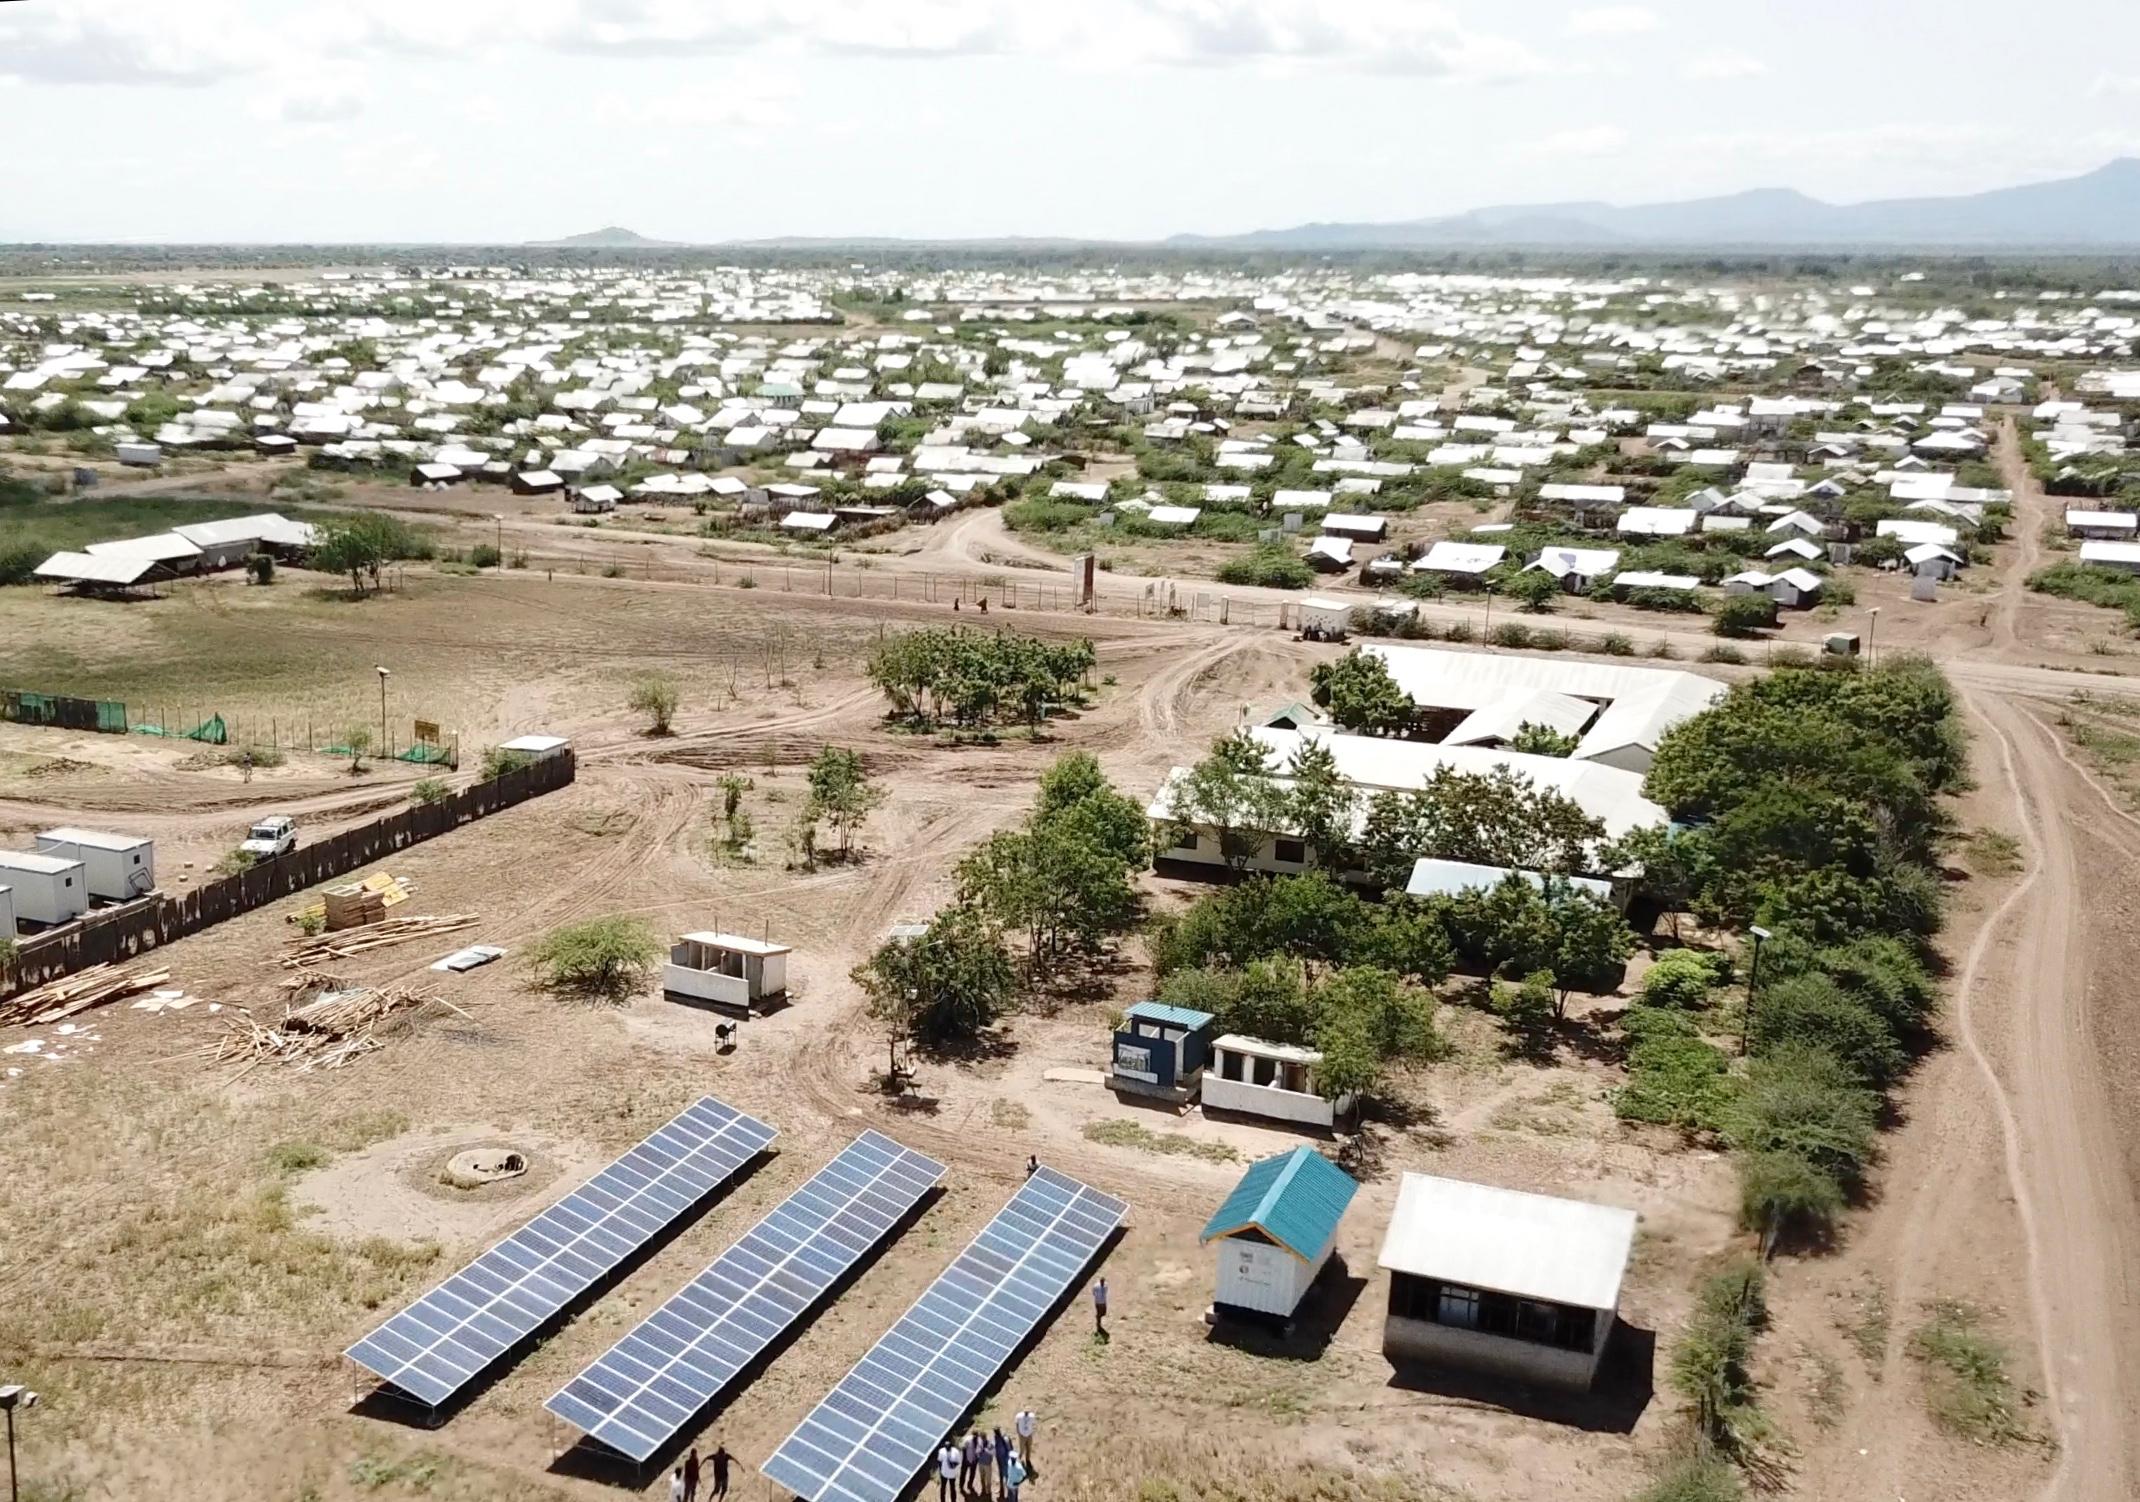 Kakuma refugee camp, Kenya, was built for people fleeing Sudan. Photo credit: Mads Uhlin Hansen.